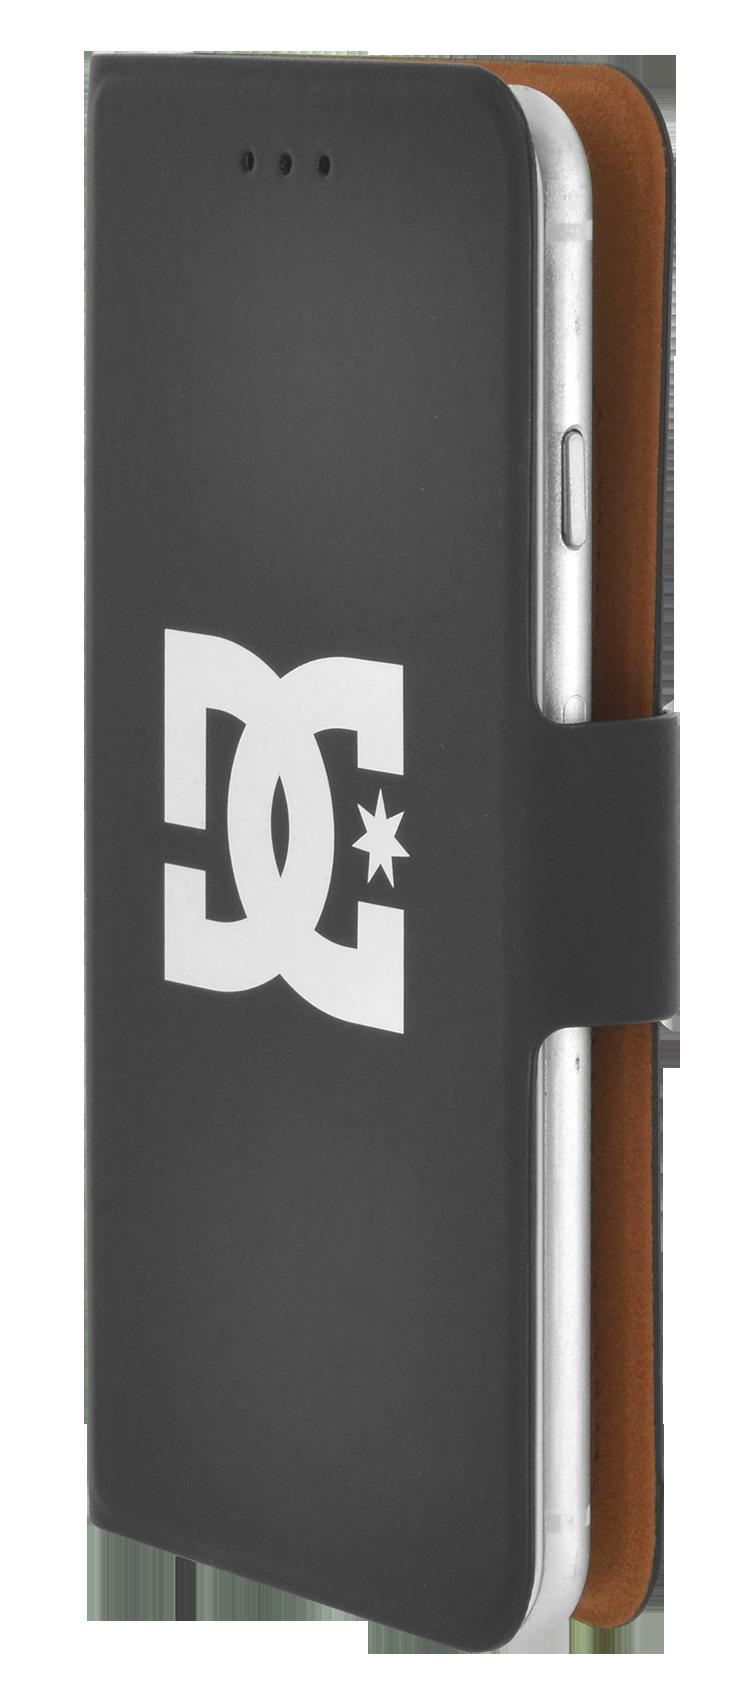 DC SHOES Universal Folio Case (Black) - Image